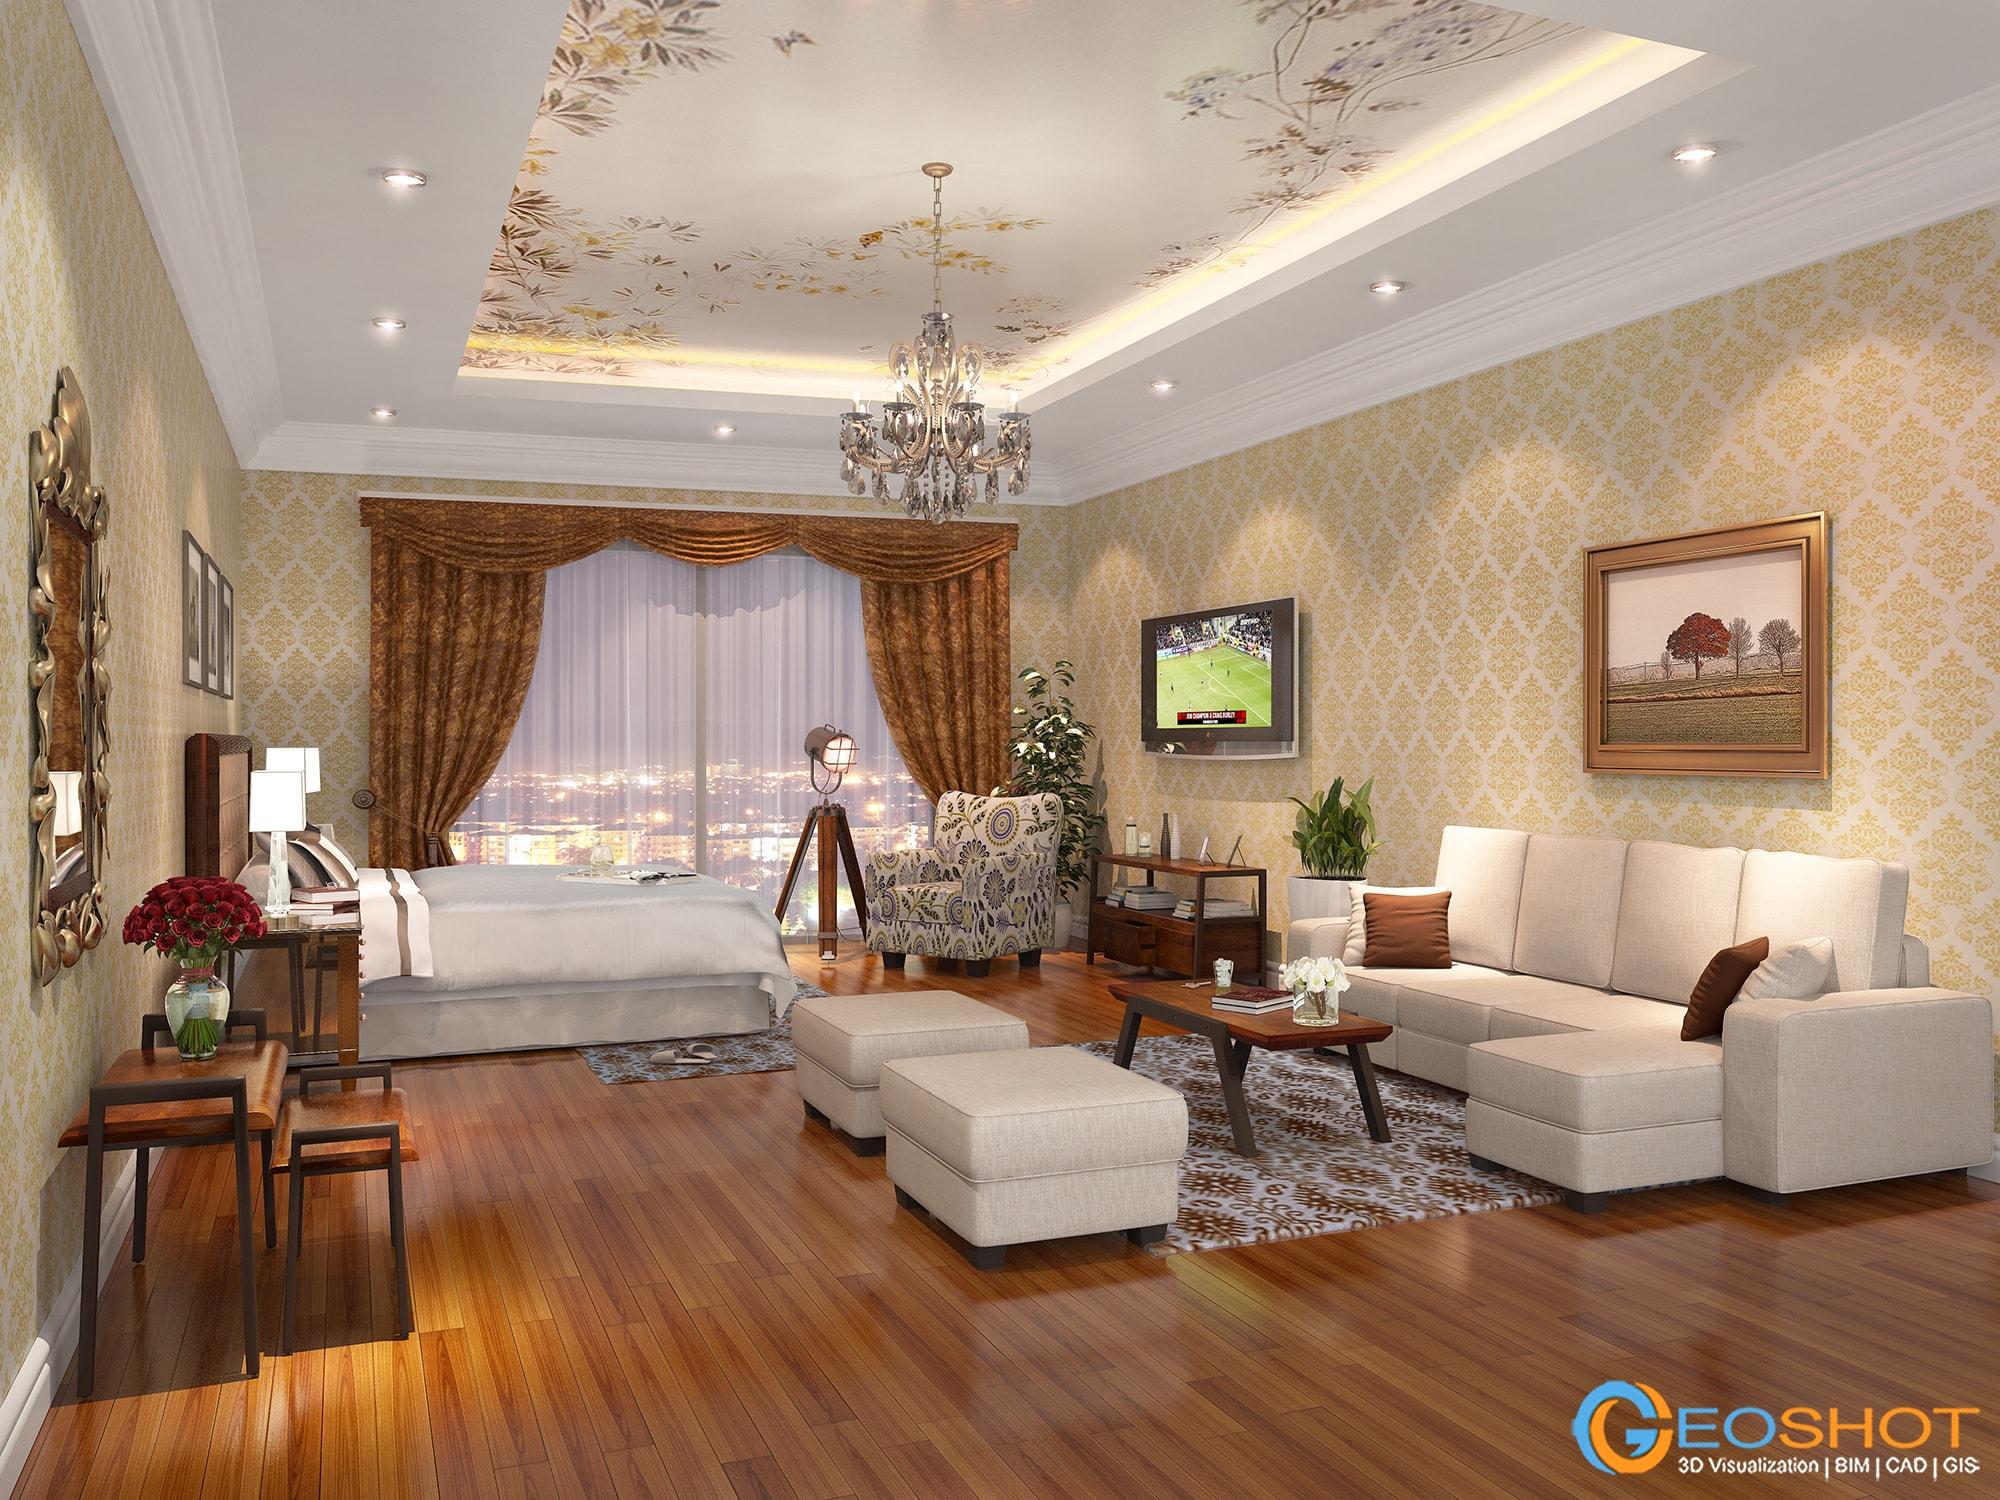 3d interior rendering interior design rendering rendering 3d. Black Bedroom Furniture Sets. Home Design Ideas